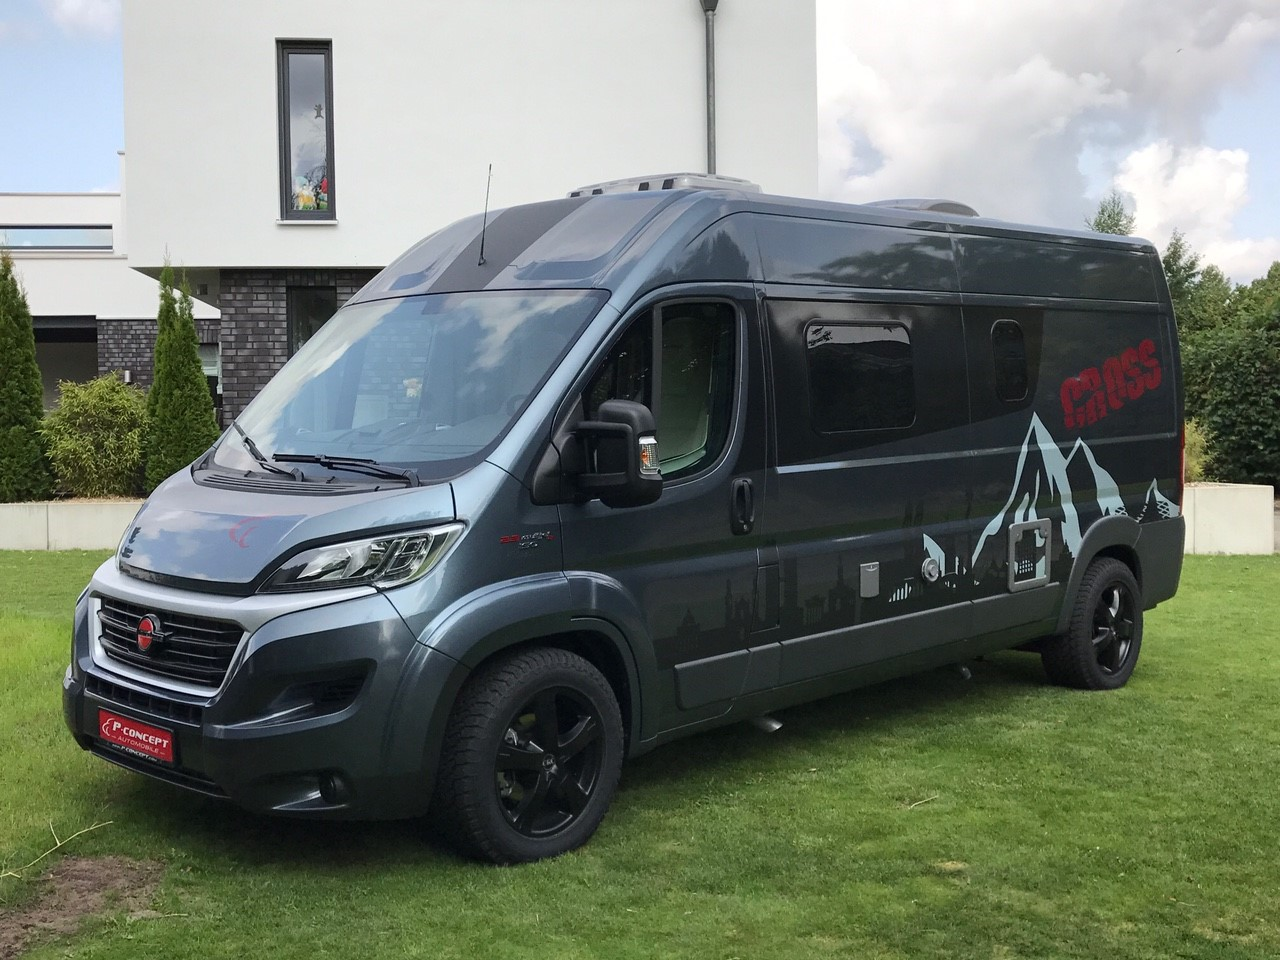 b rstner city car cross edition p concept reisemobile. Black Bedroom Furniture Sets. Home Design Ideas